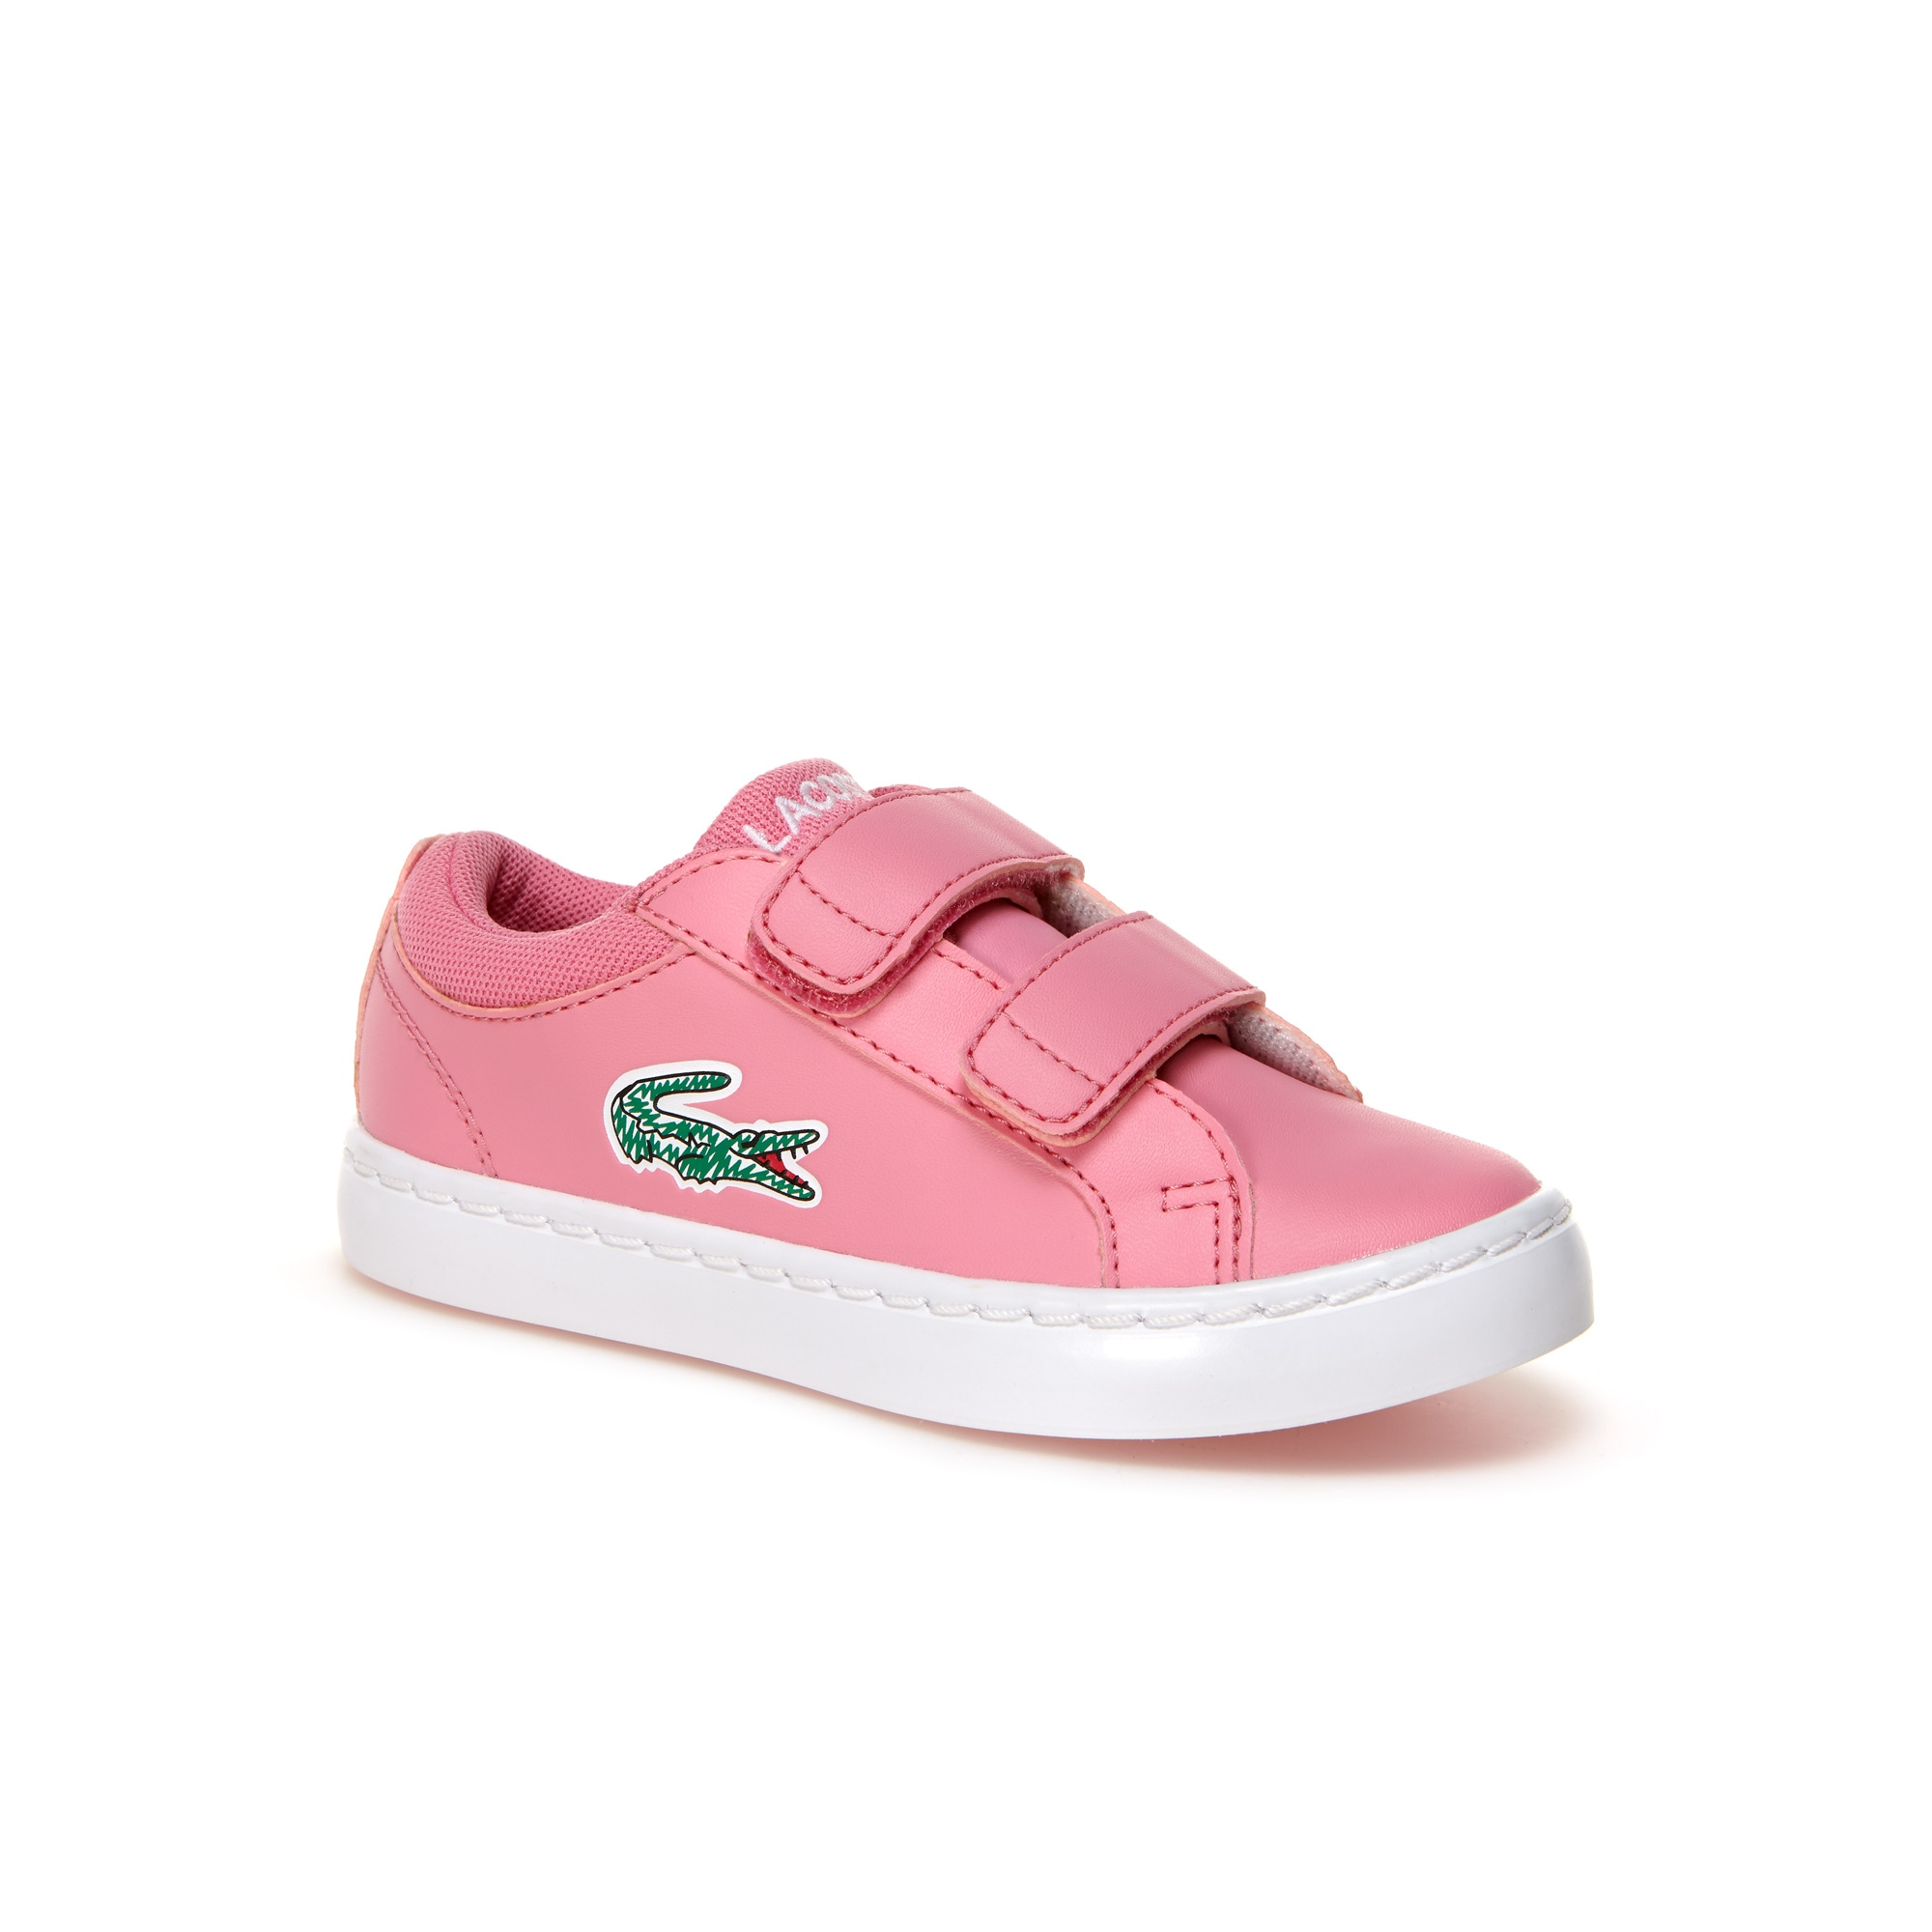 Straightset Lace kindersneakers leather-look